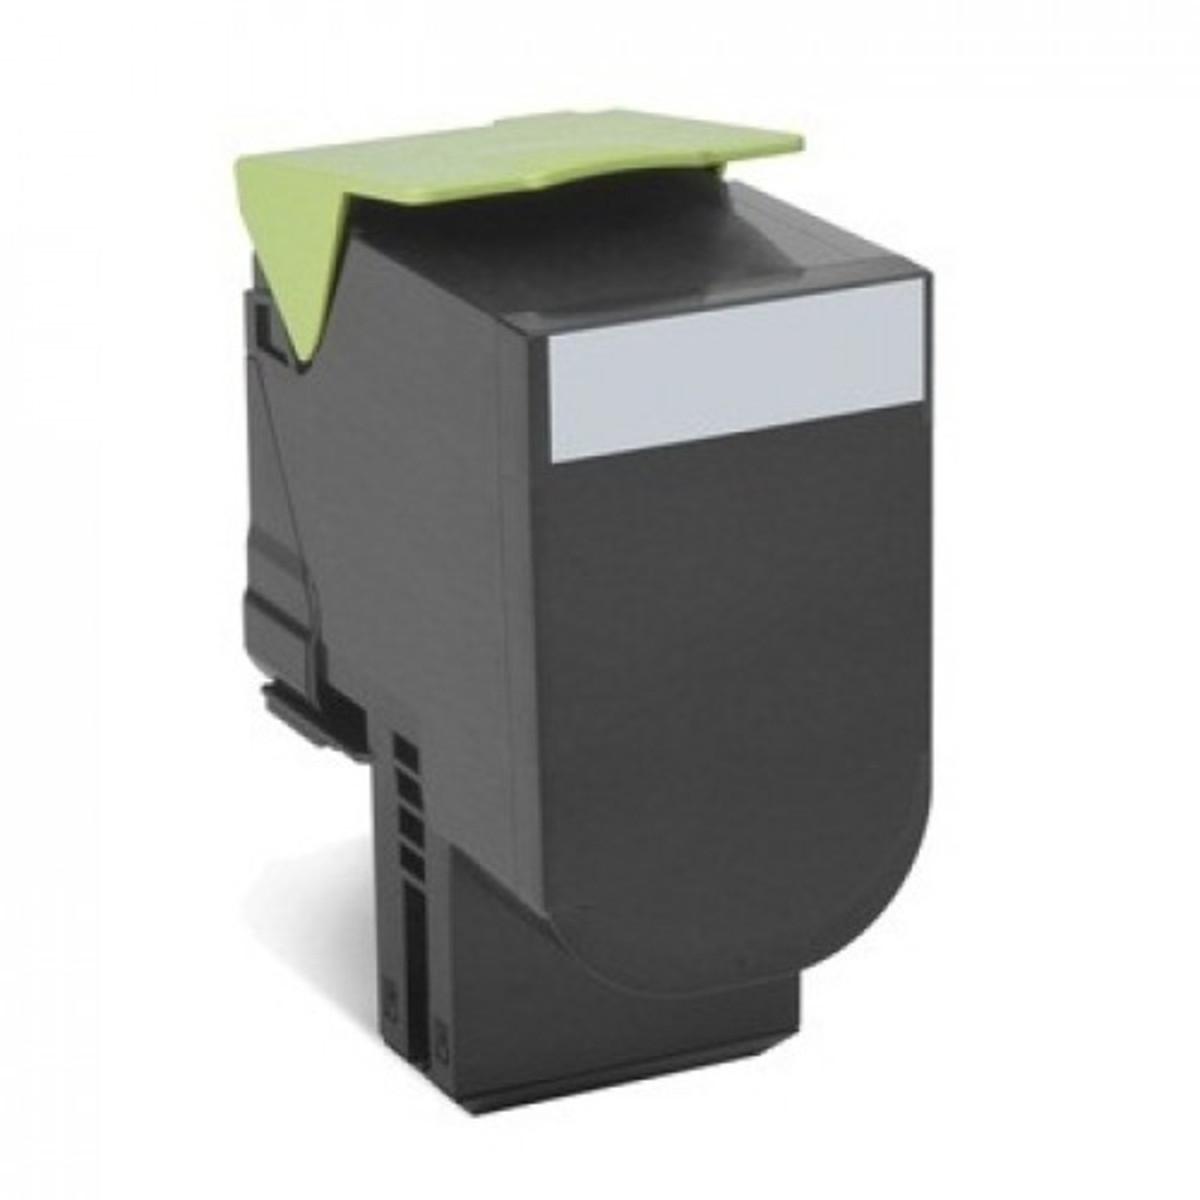 Lexmark 808HK Black Toner Cartridge - High Yield